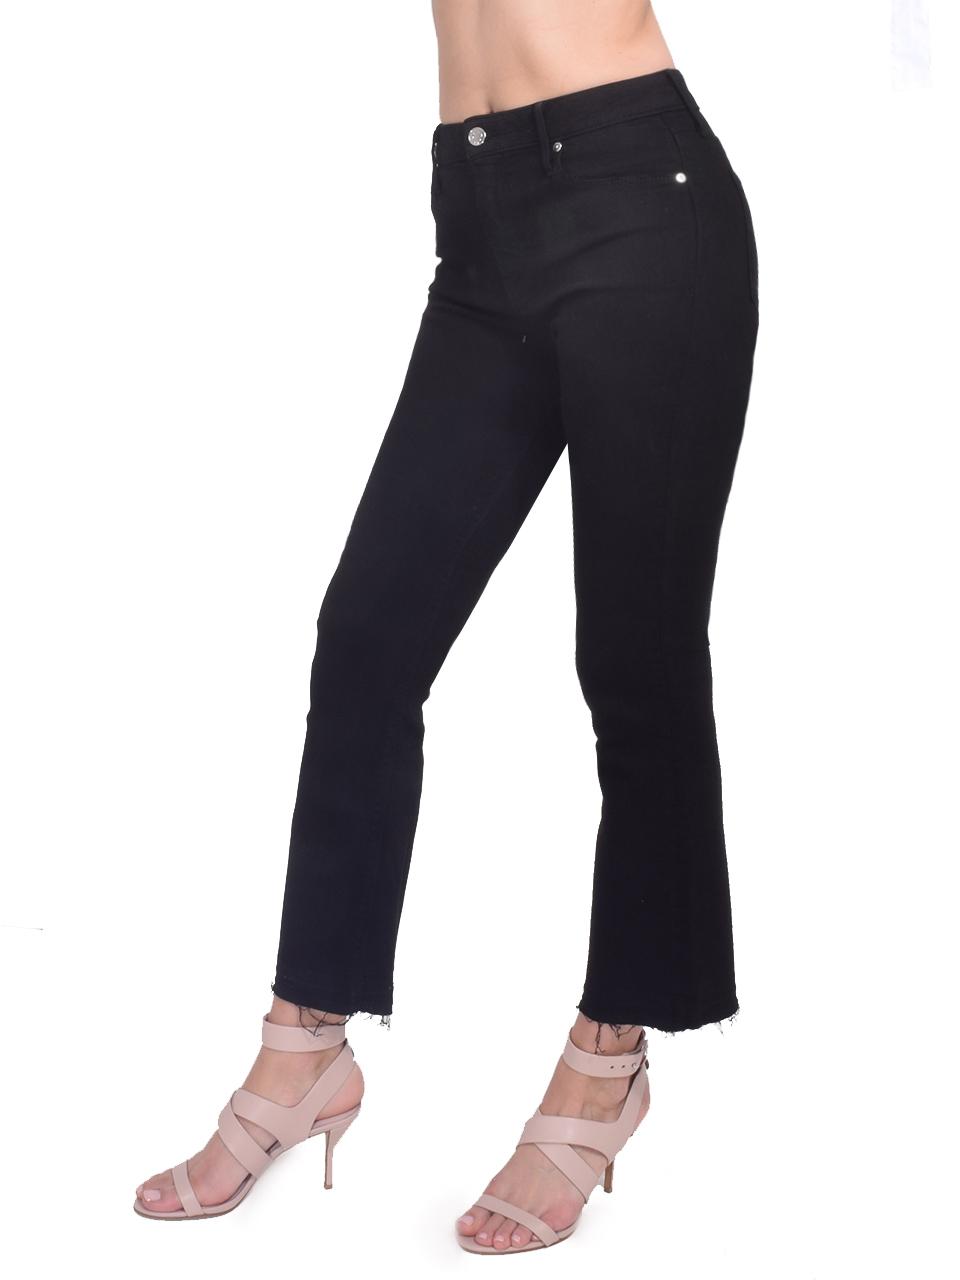 RtA Brandi Jeans in Max Black Side View